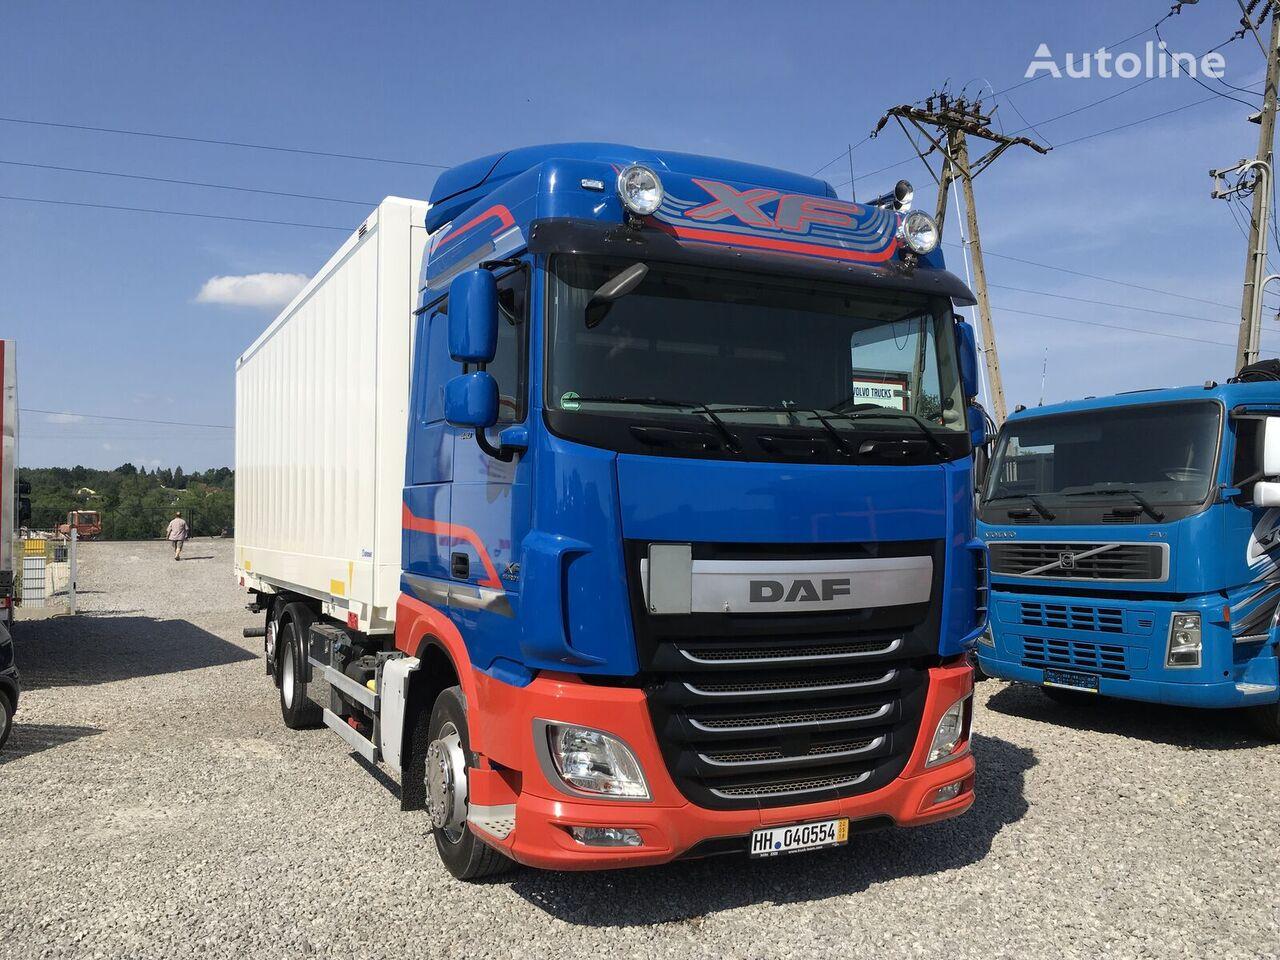 izoterminis sunkvežimis DAF XF 106.440 E6 105 kontener 6x2 , Super stan